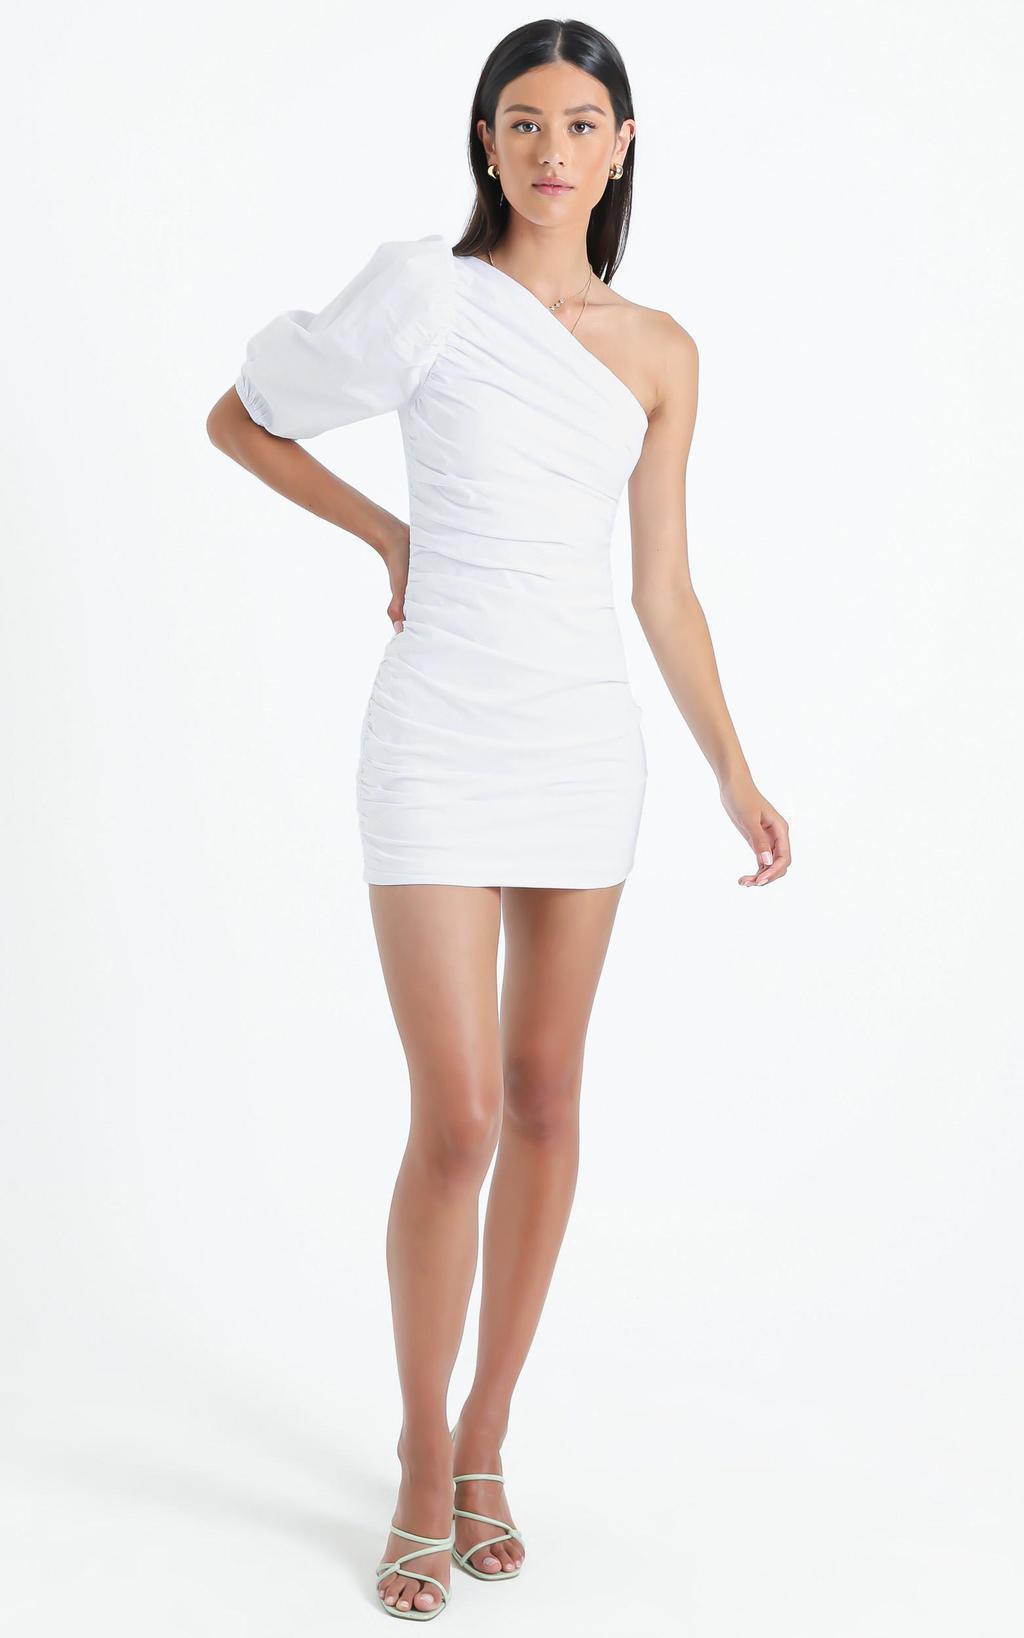 White one-shoulder dress from Showpo